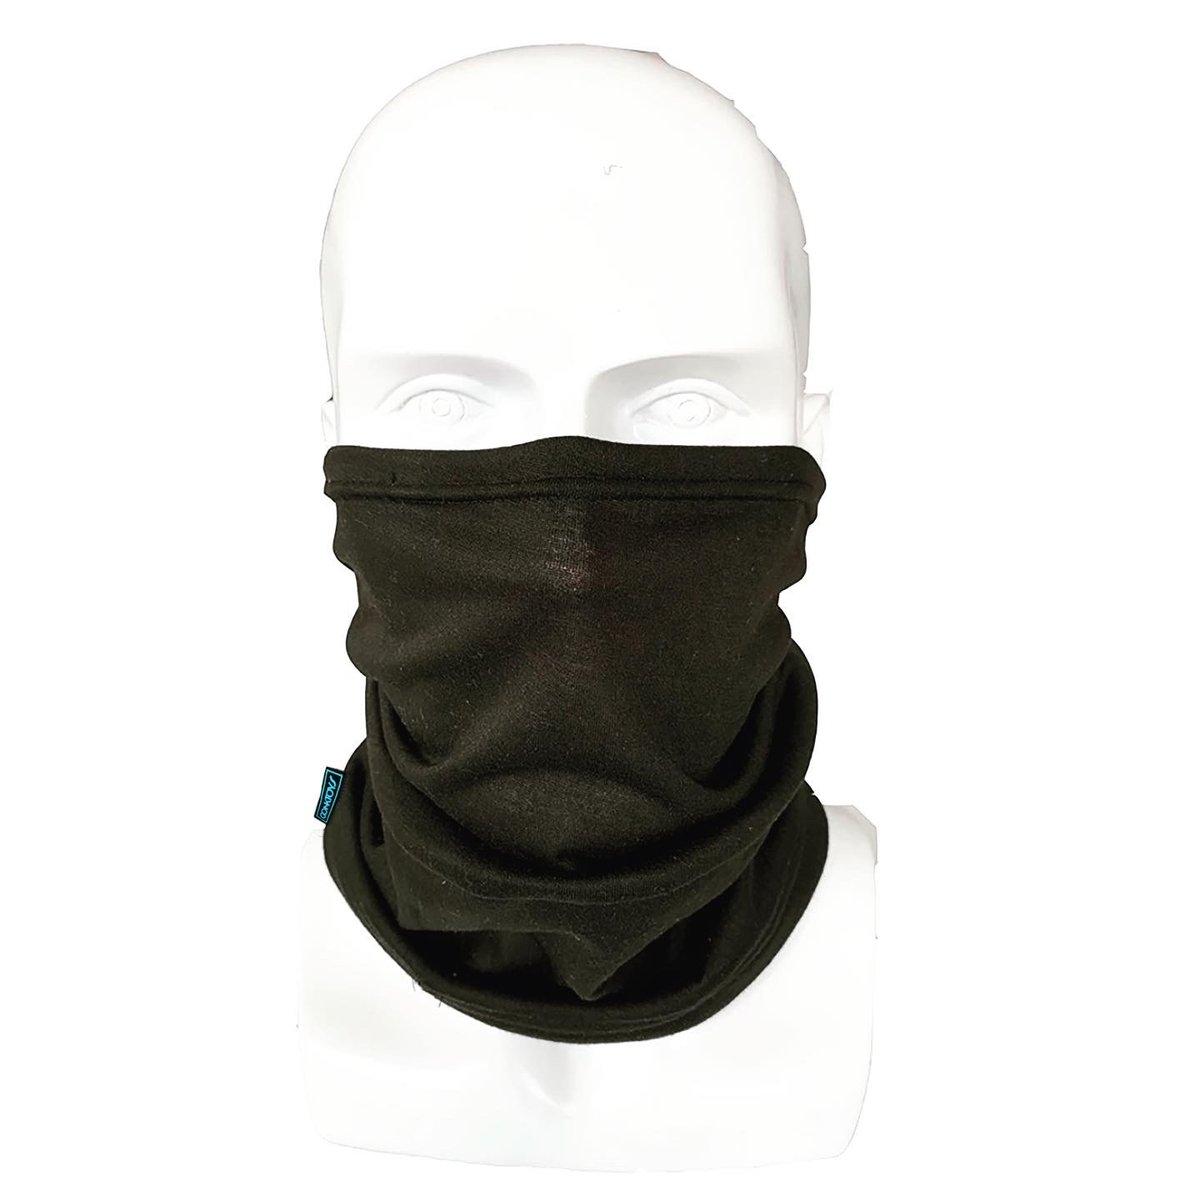 Image of GonkGaiter - Mask Neck Gaiter